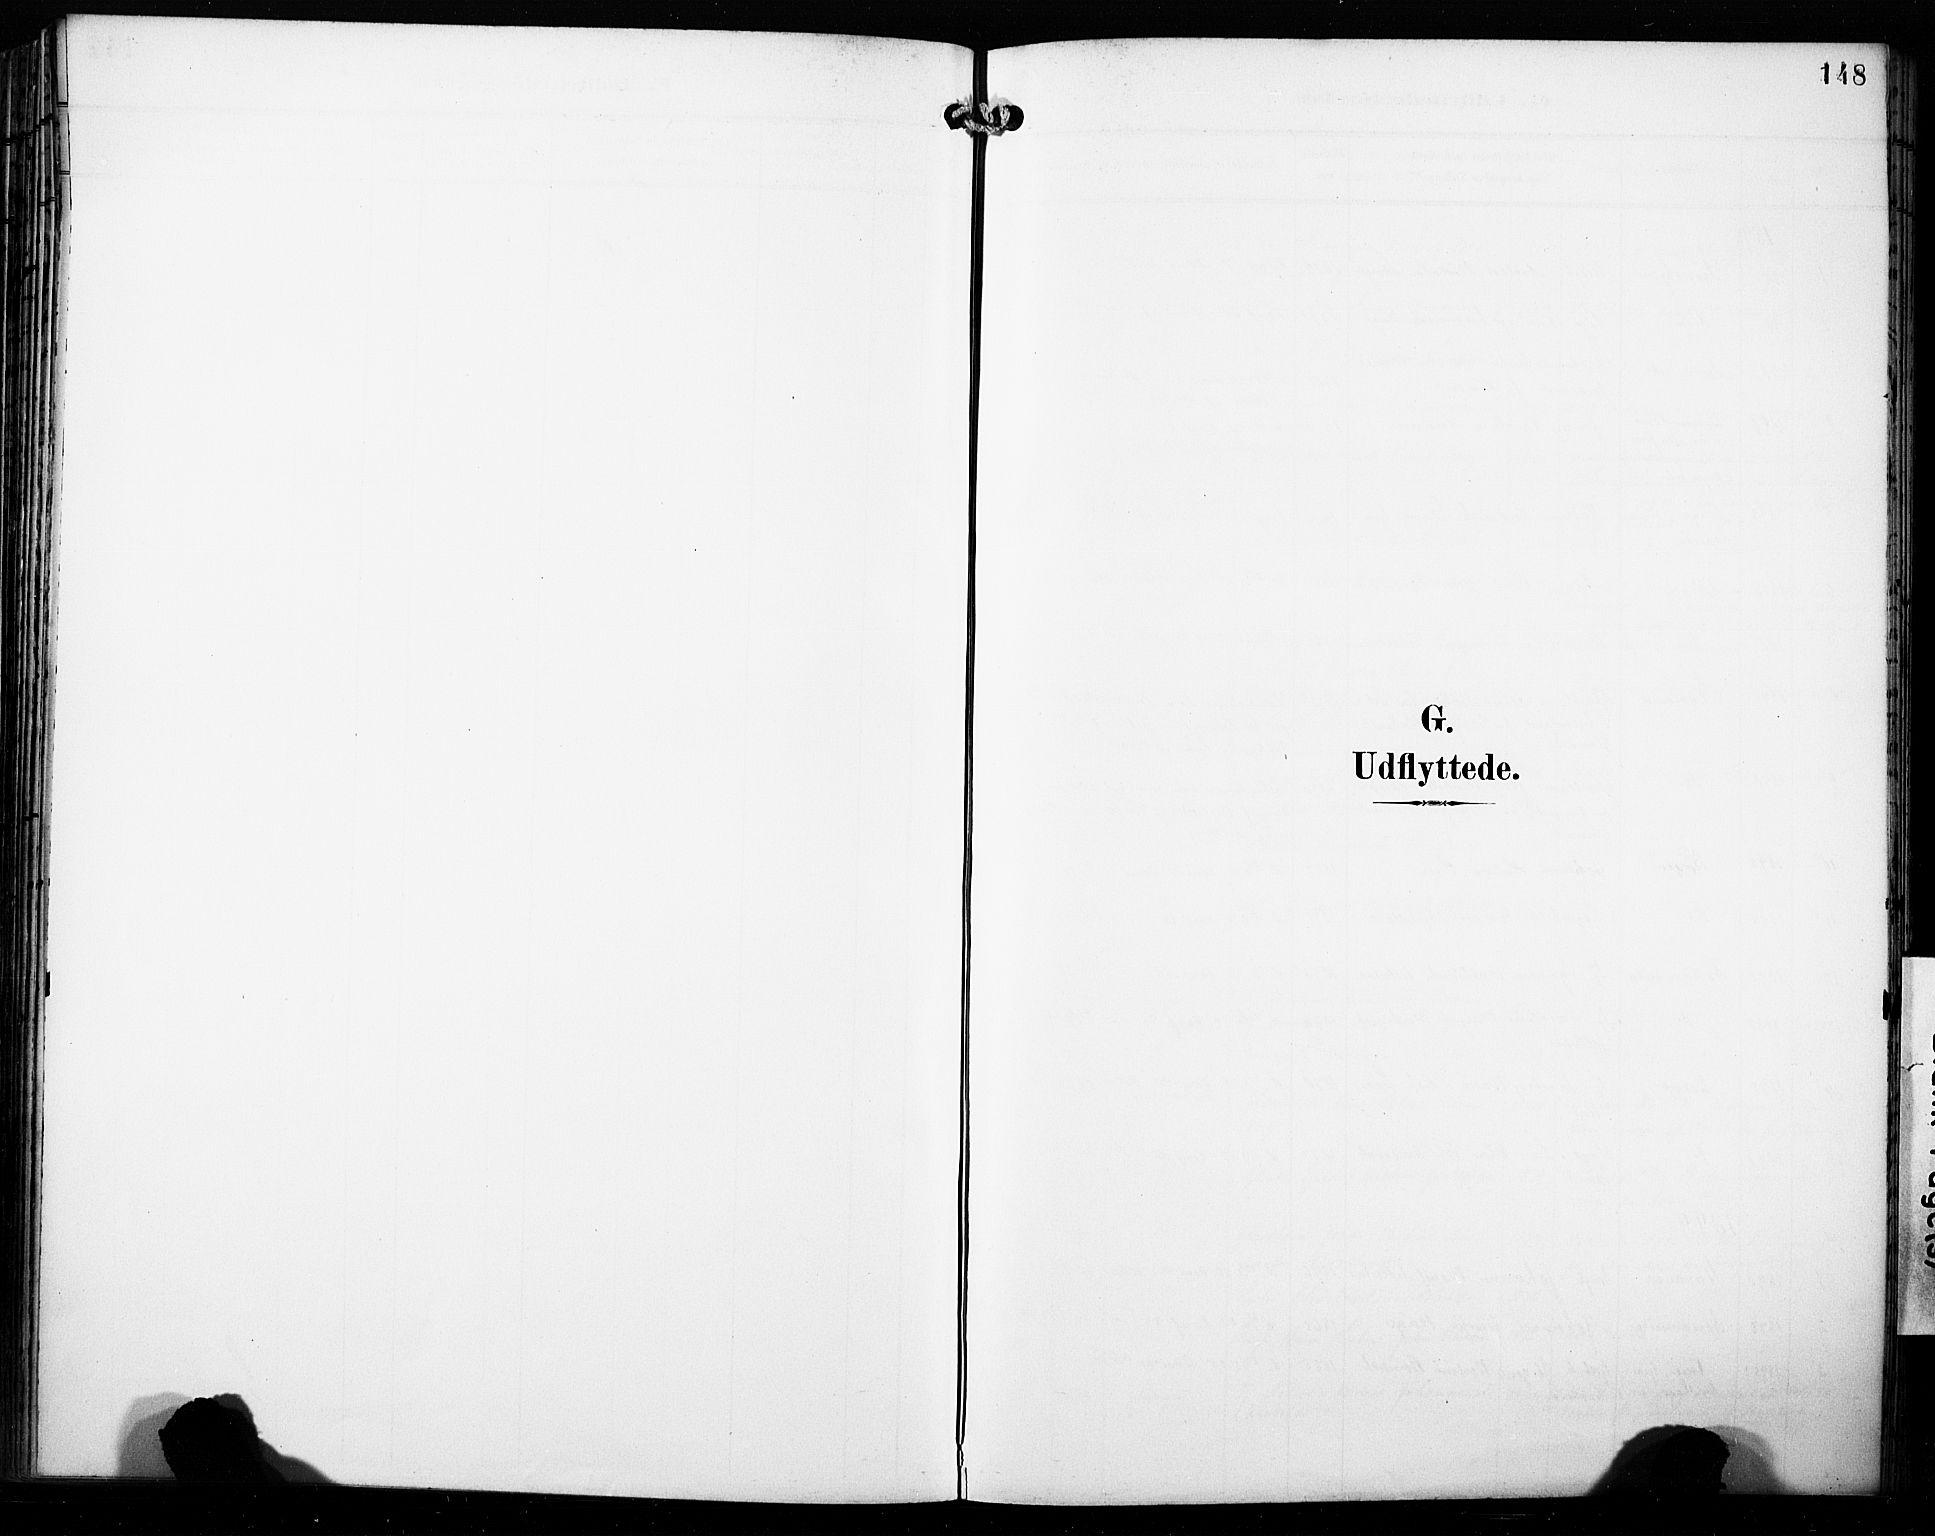 SAB, Fana Sokneprestembete, H/Haa/Haab/L0003: Ministerialbok nr. B 3, 1898-1907, s. 148